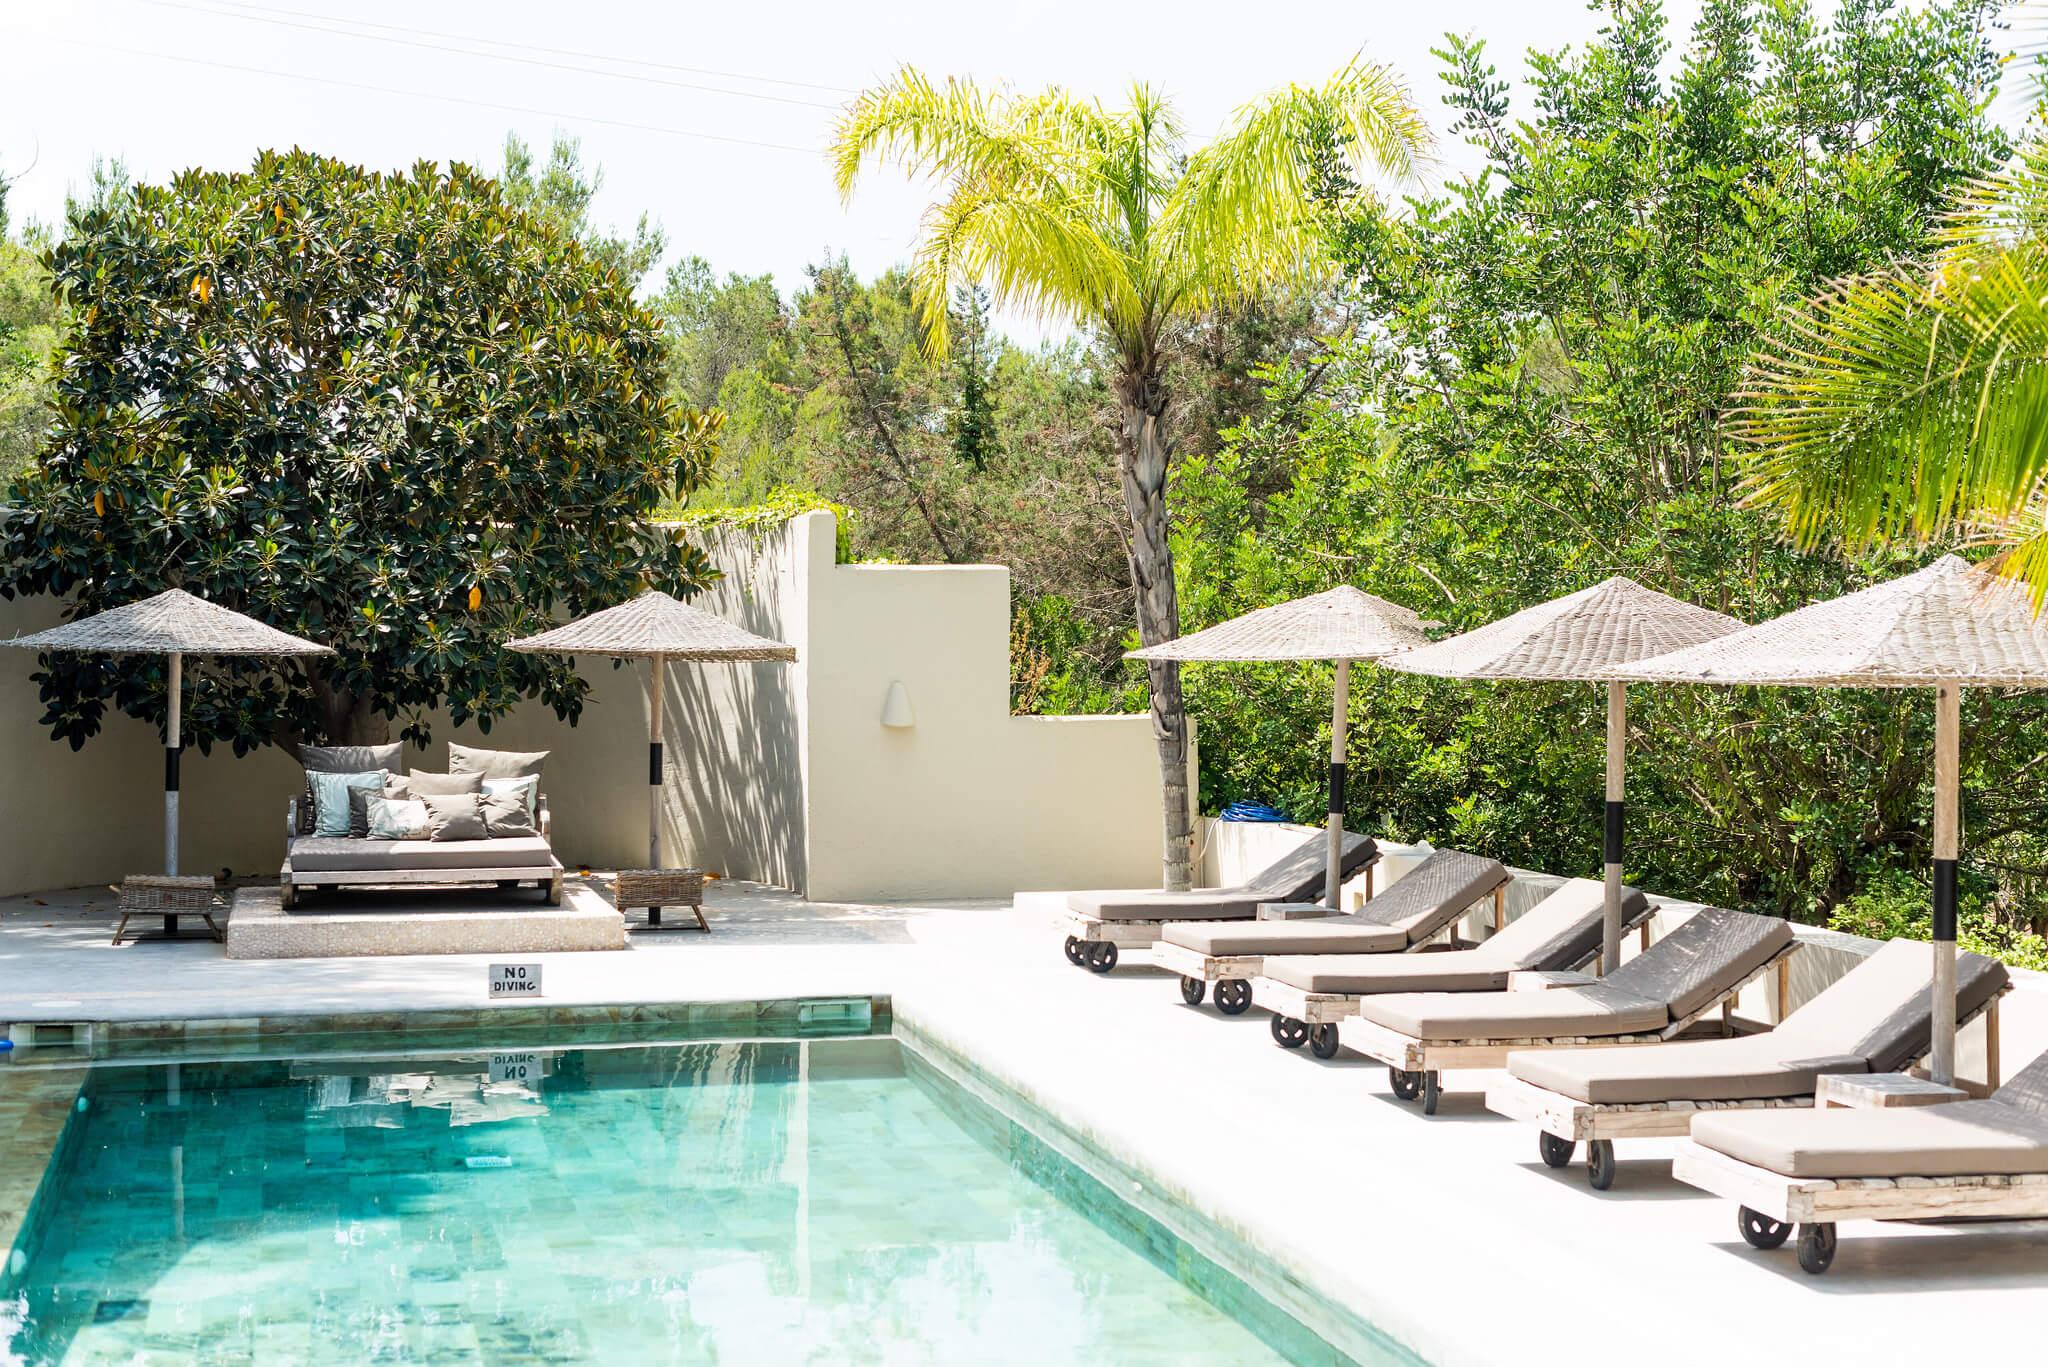 https://www.white-ibiza.com/wp-content/uploads/2020/05/white-ibiza-villas-can-riviere-exterior-pool.jpg